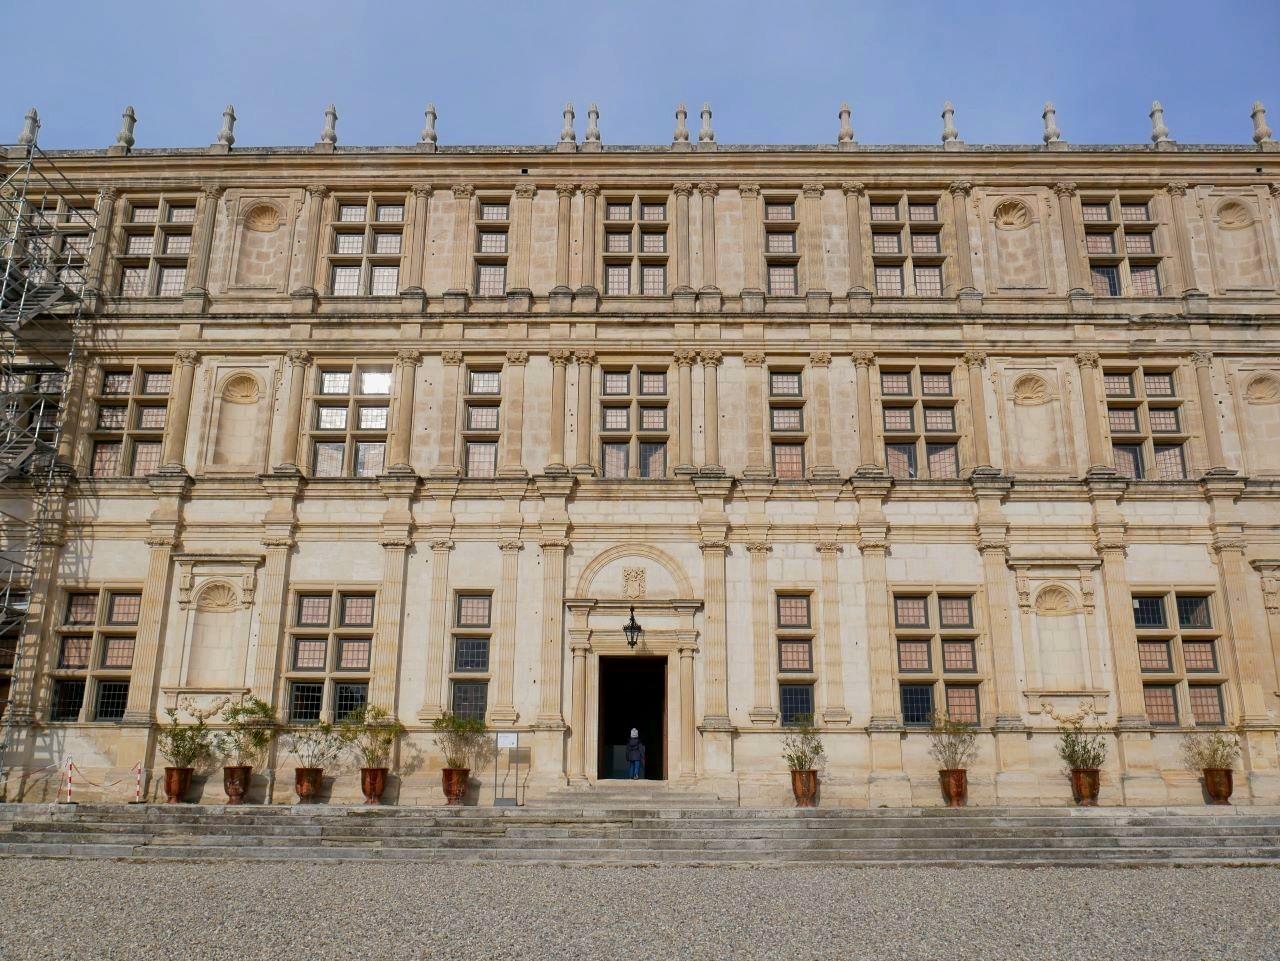 Balade en famille drome, château de Grignan. Sublime façade